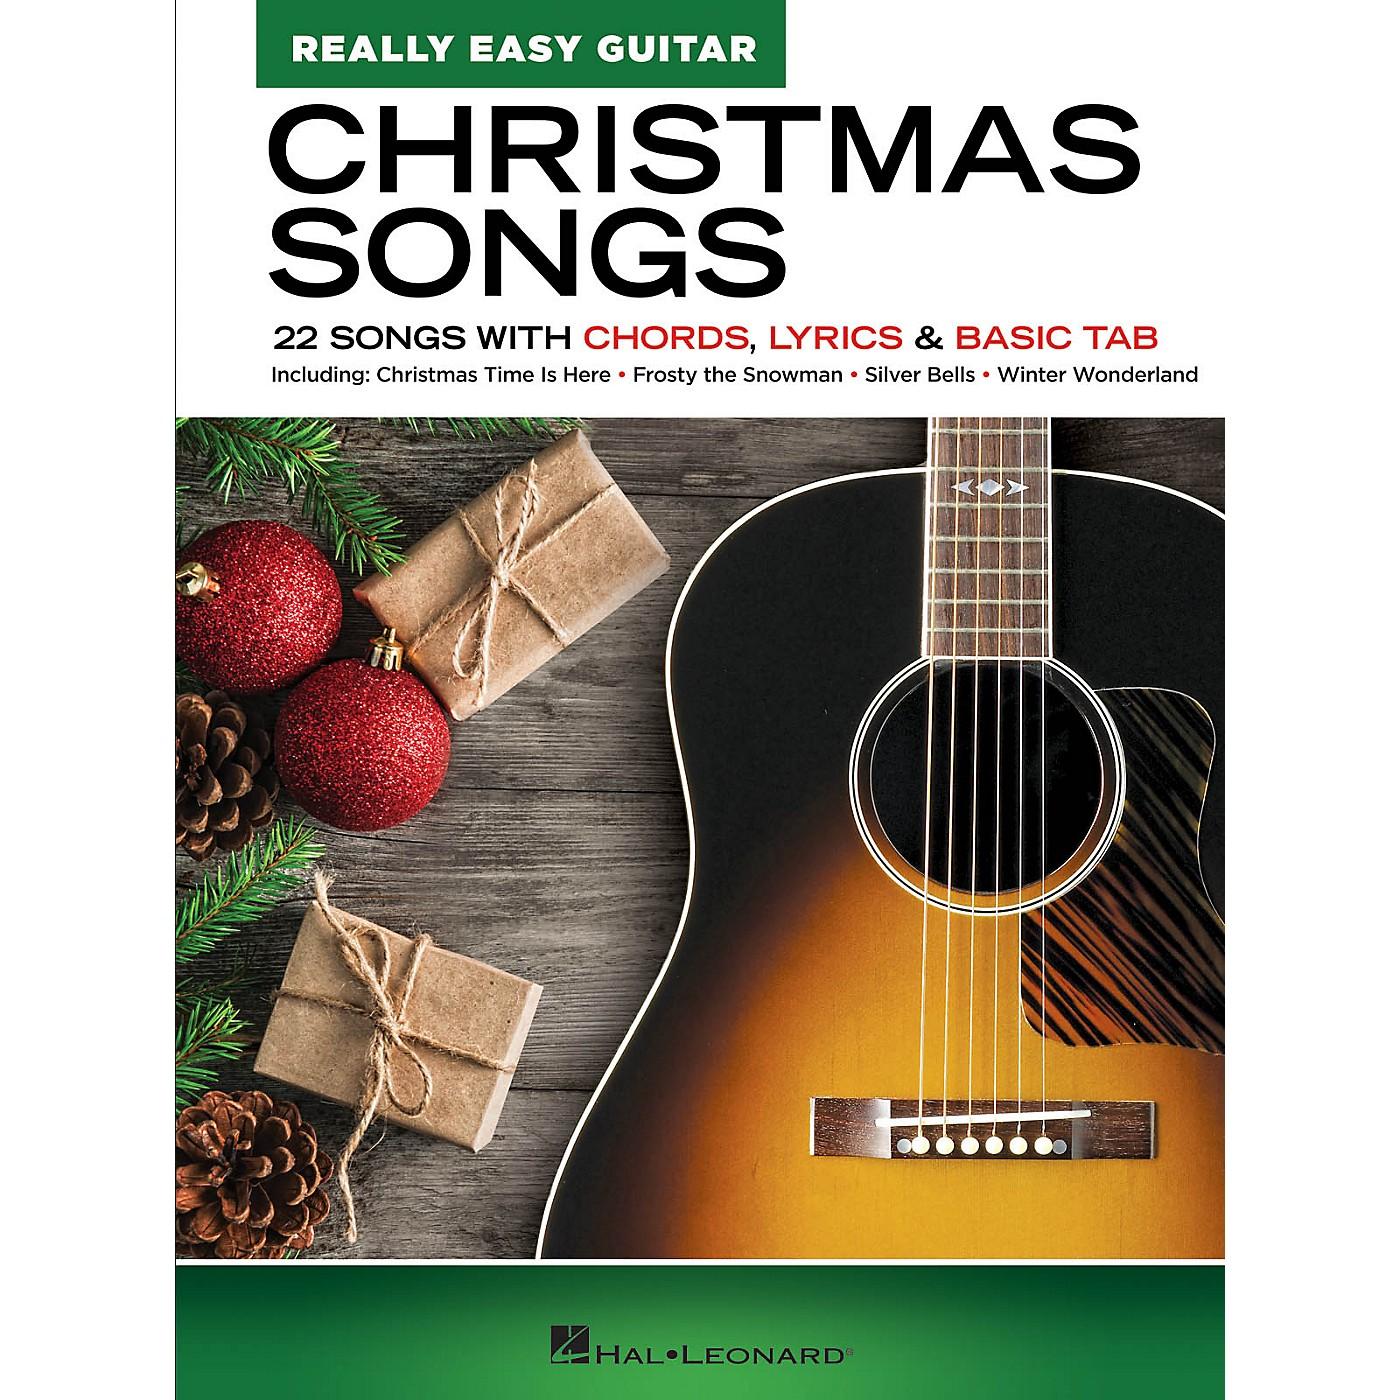 Hal Leonard Christmas Songs - Really Easy Guitar Series Songbook thumbnail